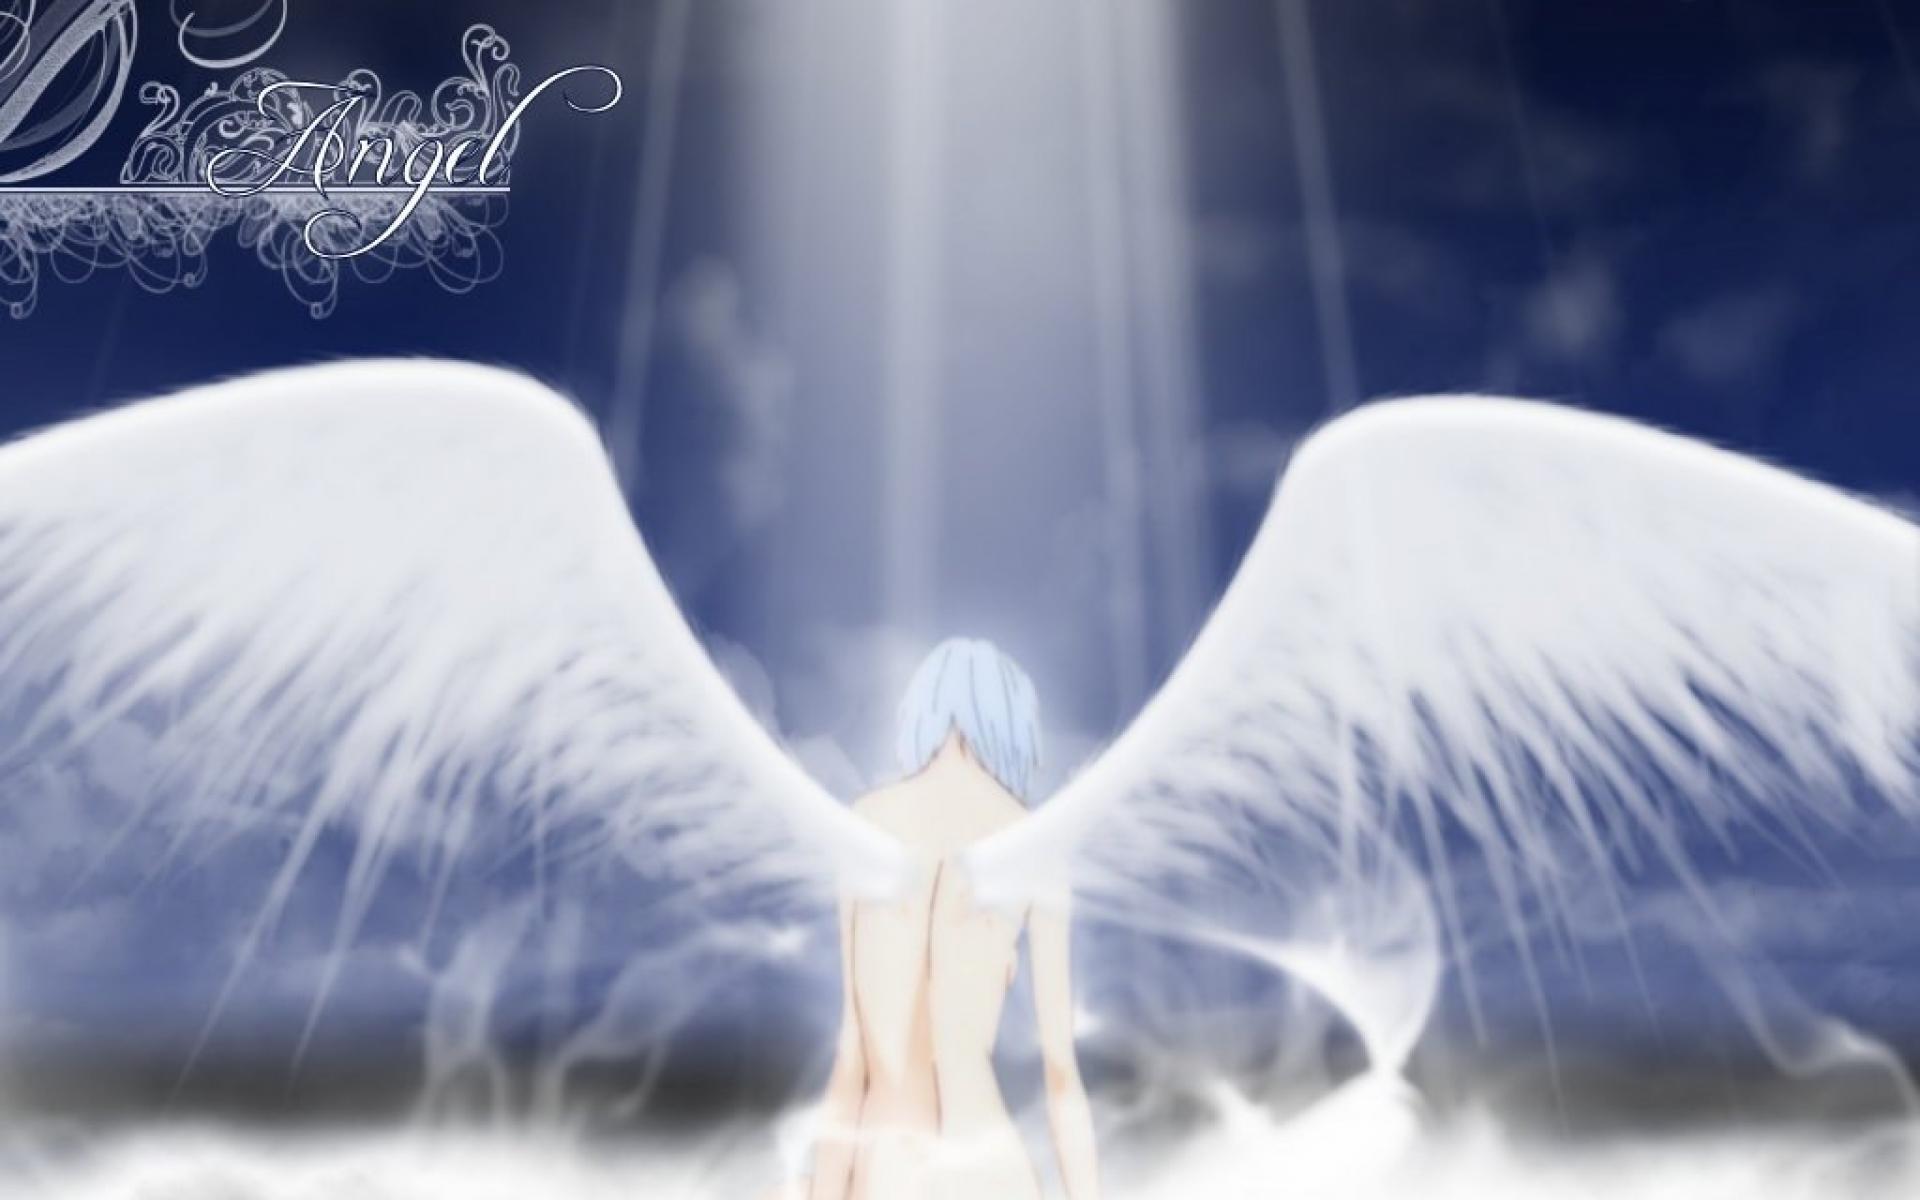 Rei Angel Wings Light Manga Anime HD Wallpaper 2343 1920x1200